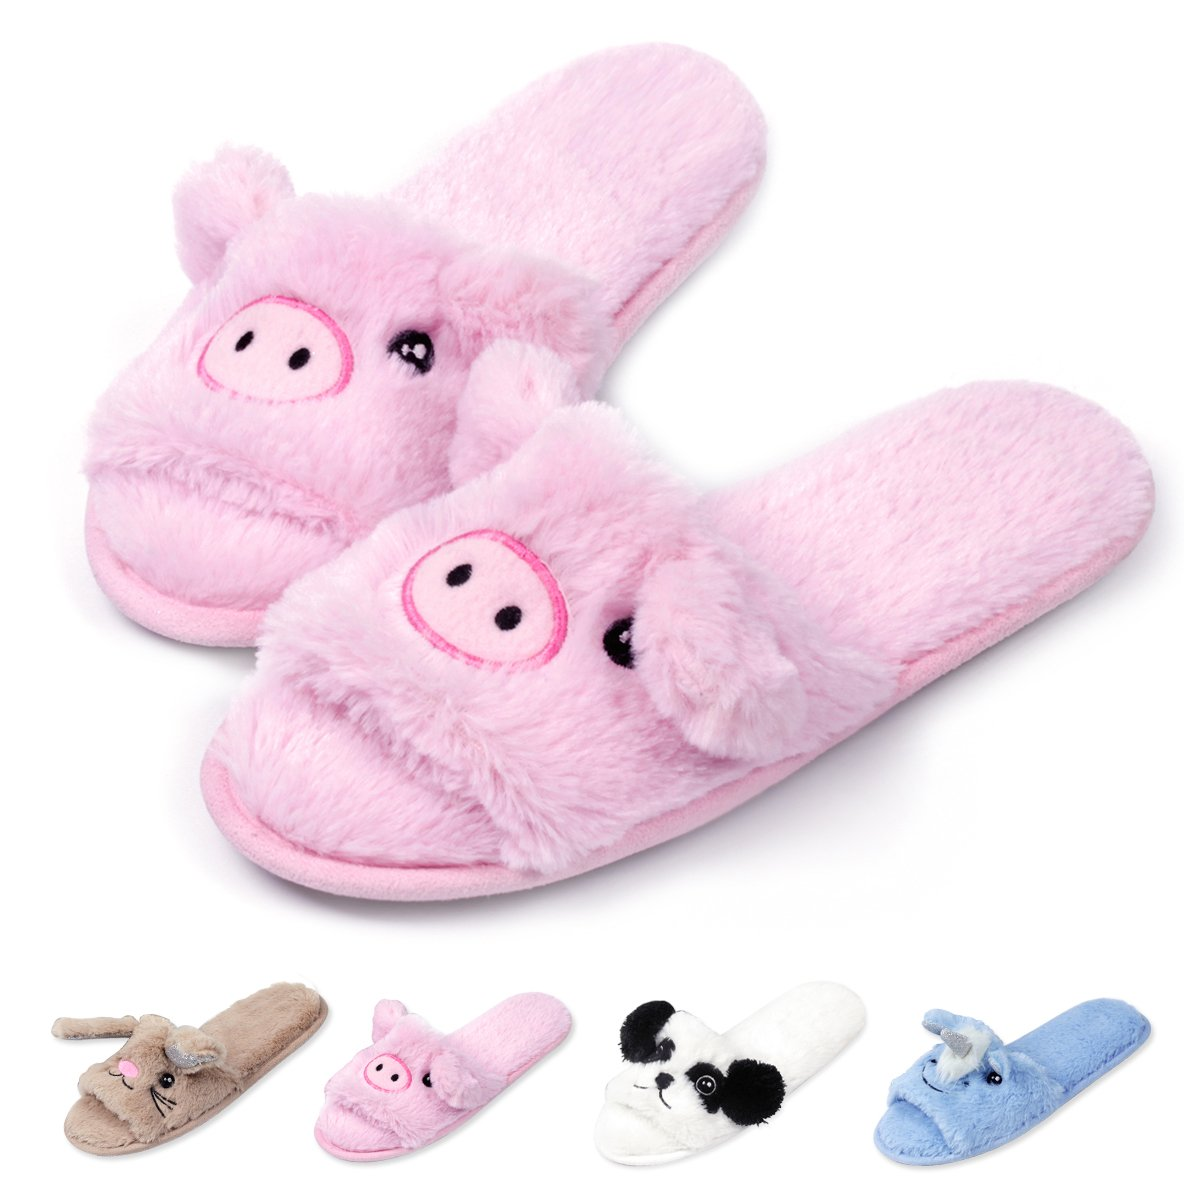 Womens Open Toe Slippers | Cute Bunny Unicorn Animal Slipper | Soft Fleece Memory Foam Clog | Anti-Slip Sole Indoor Outdoor Shoes | Flip Flop Spa Slippers (5-6, PinkPiggy)